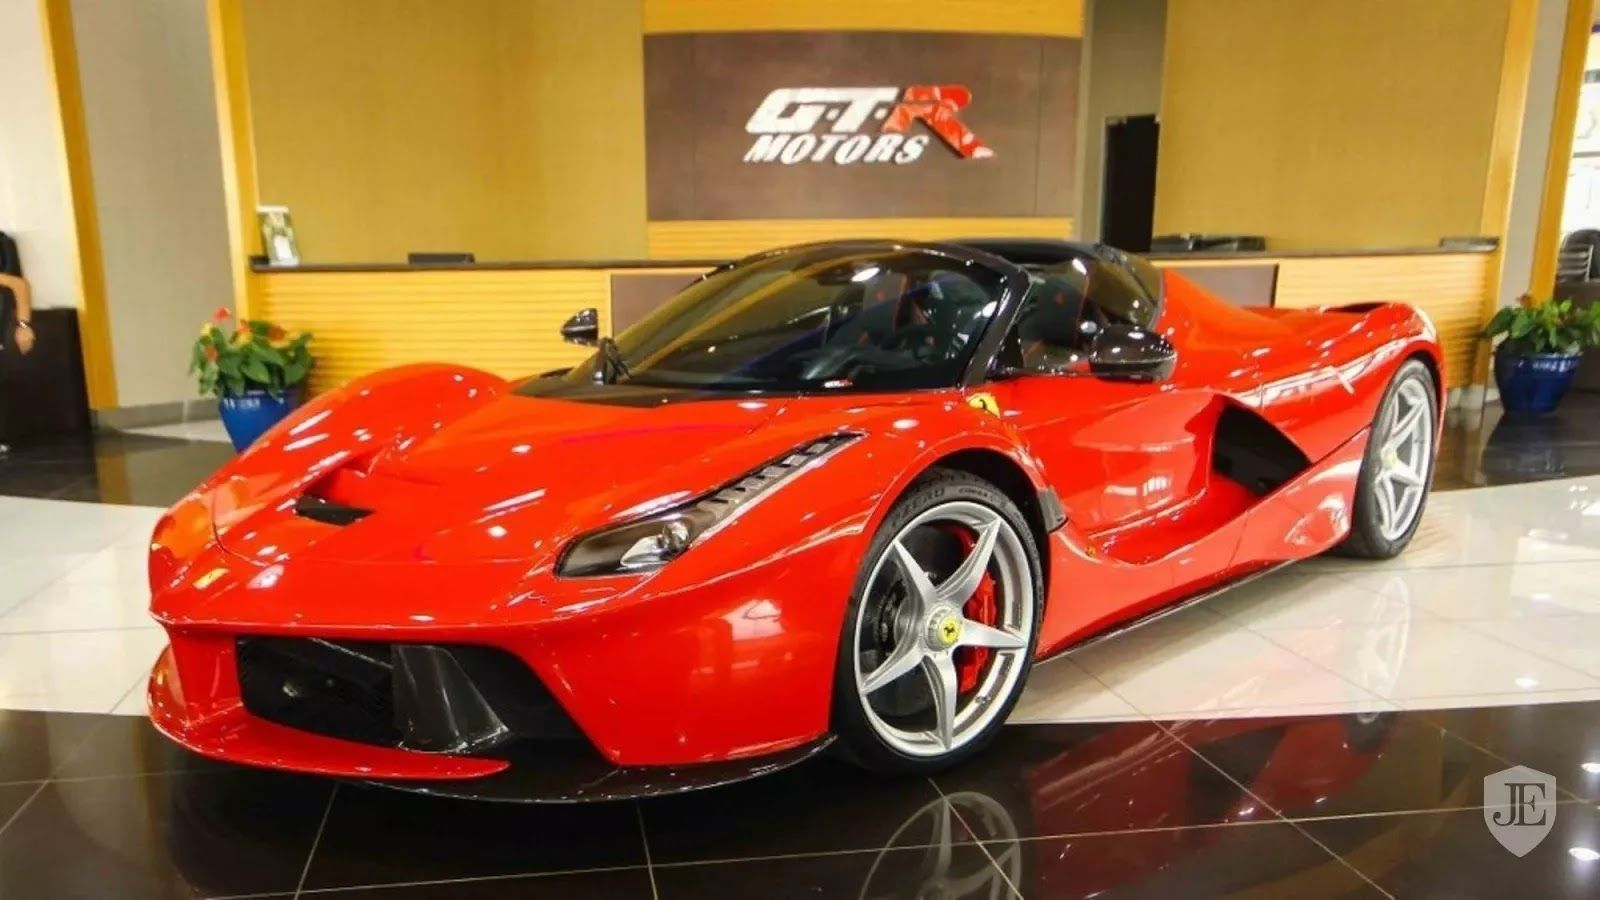 Red Laferrari Aperta In Dubai Has A 7 3 Million Asking Price